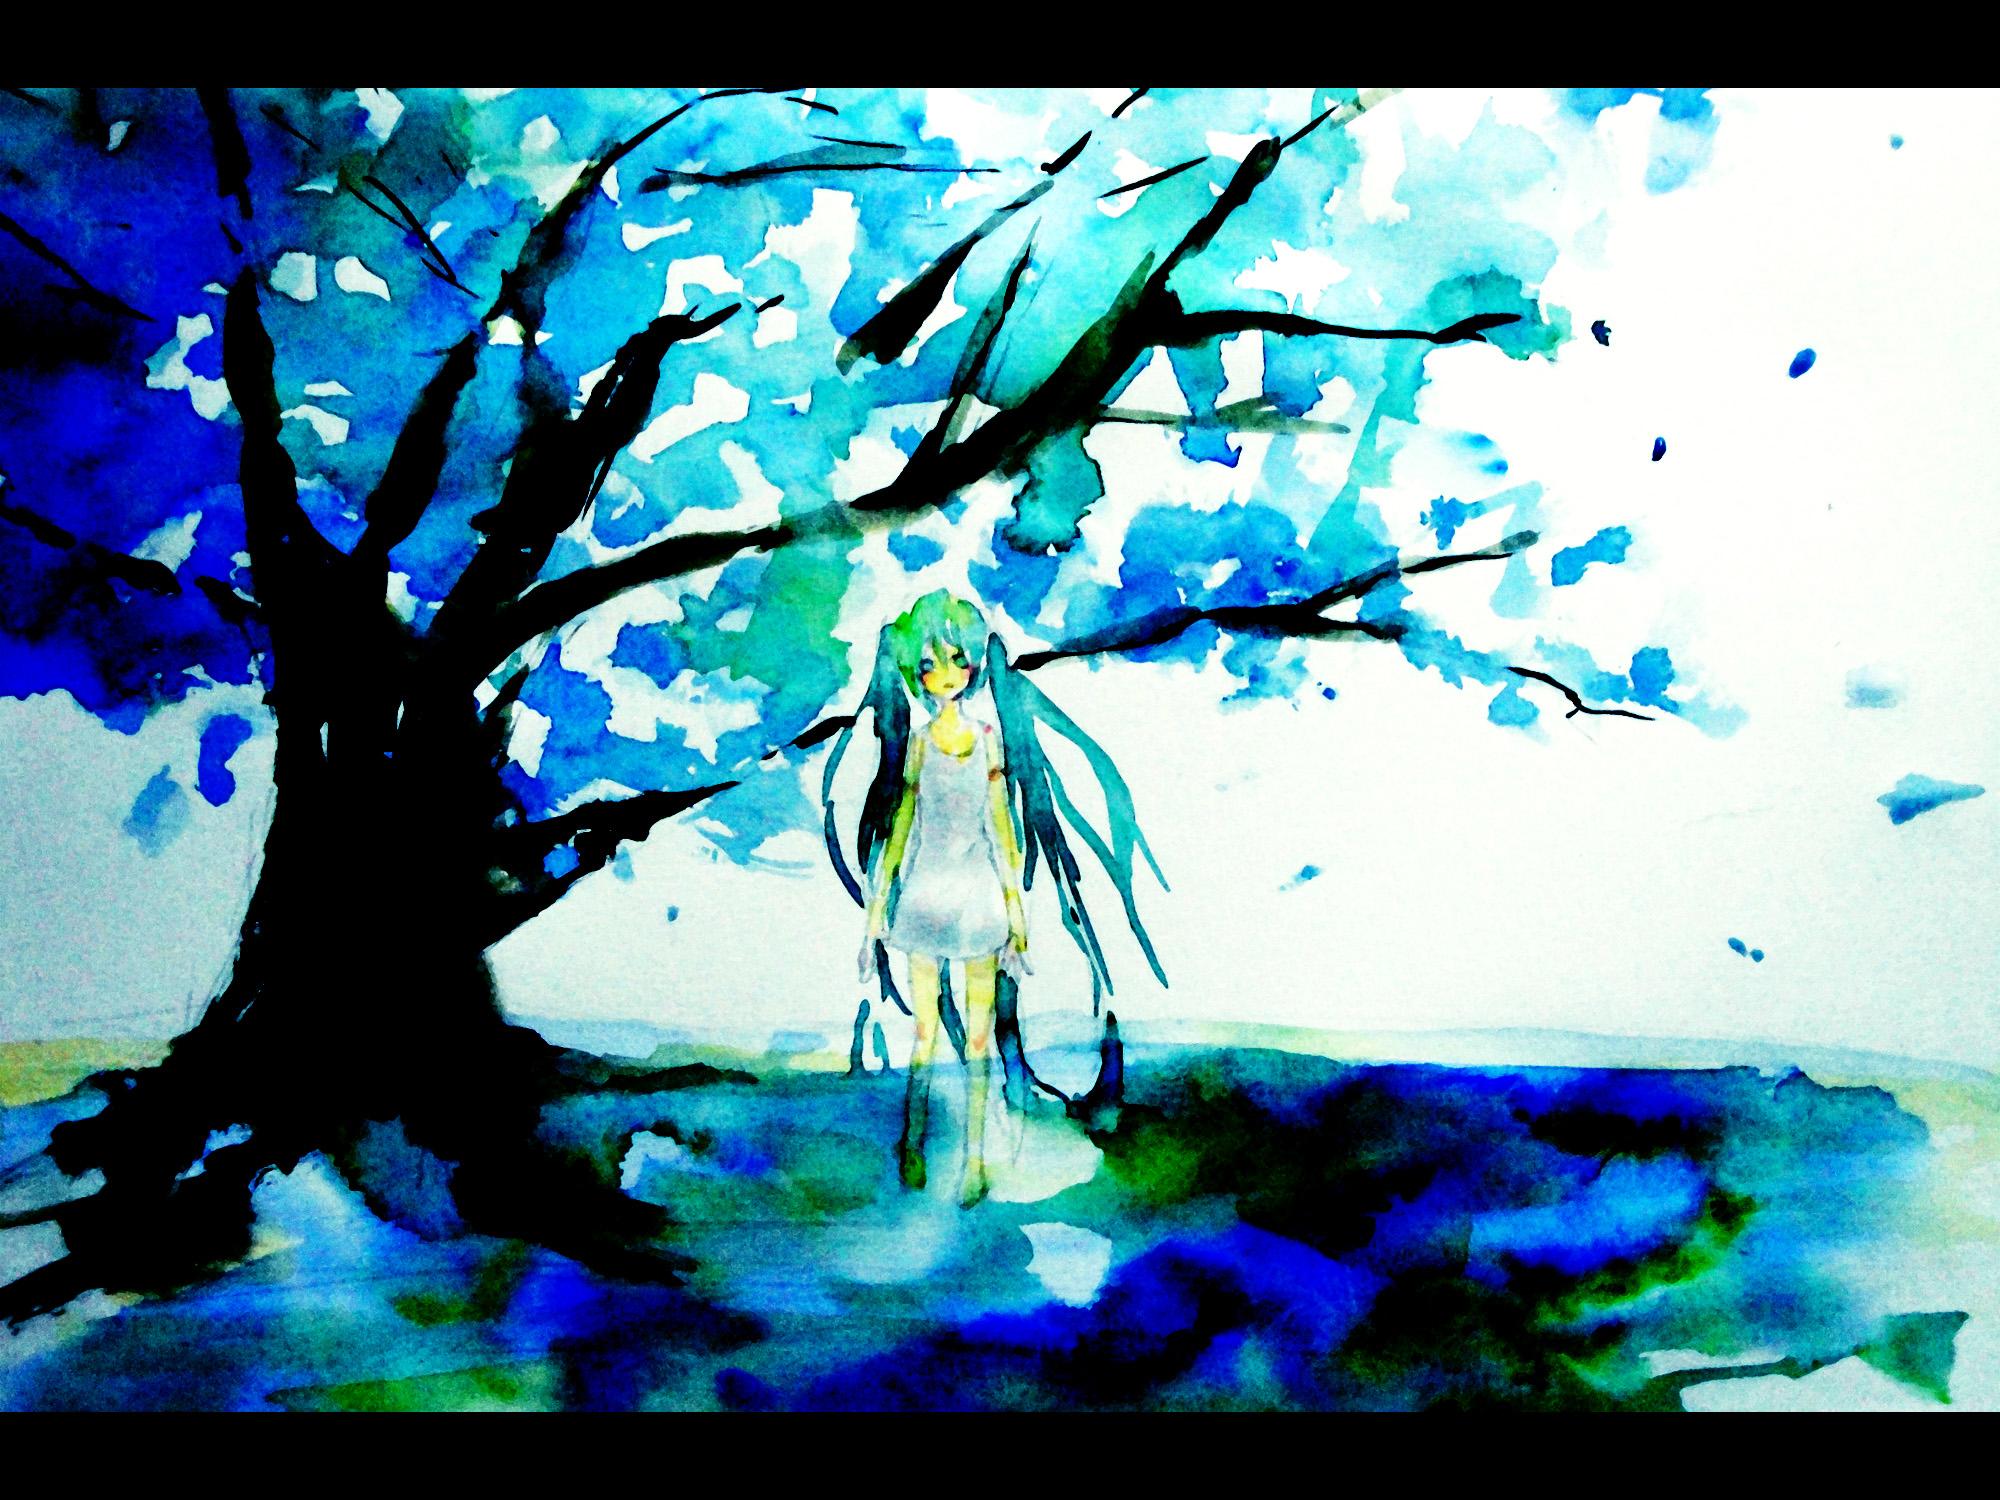 aqua_eyes aqua_hair blue dress hatsune_miku tree twintails vocaloid